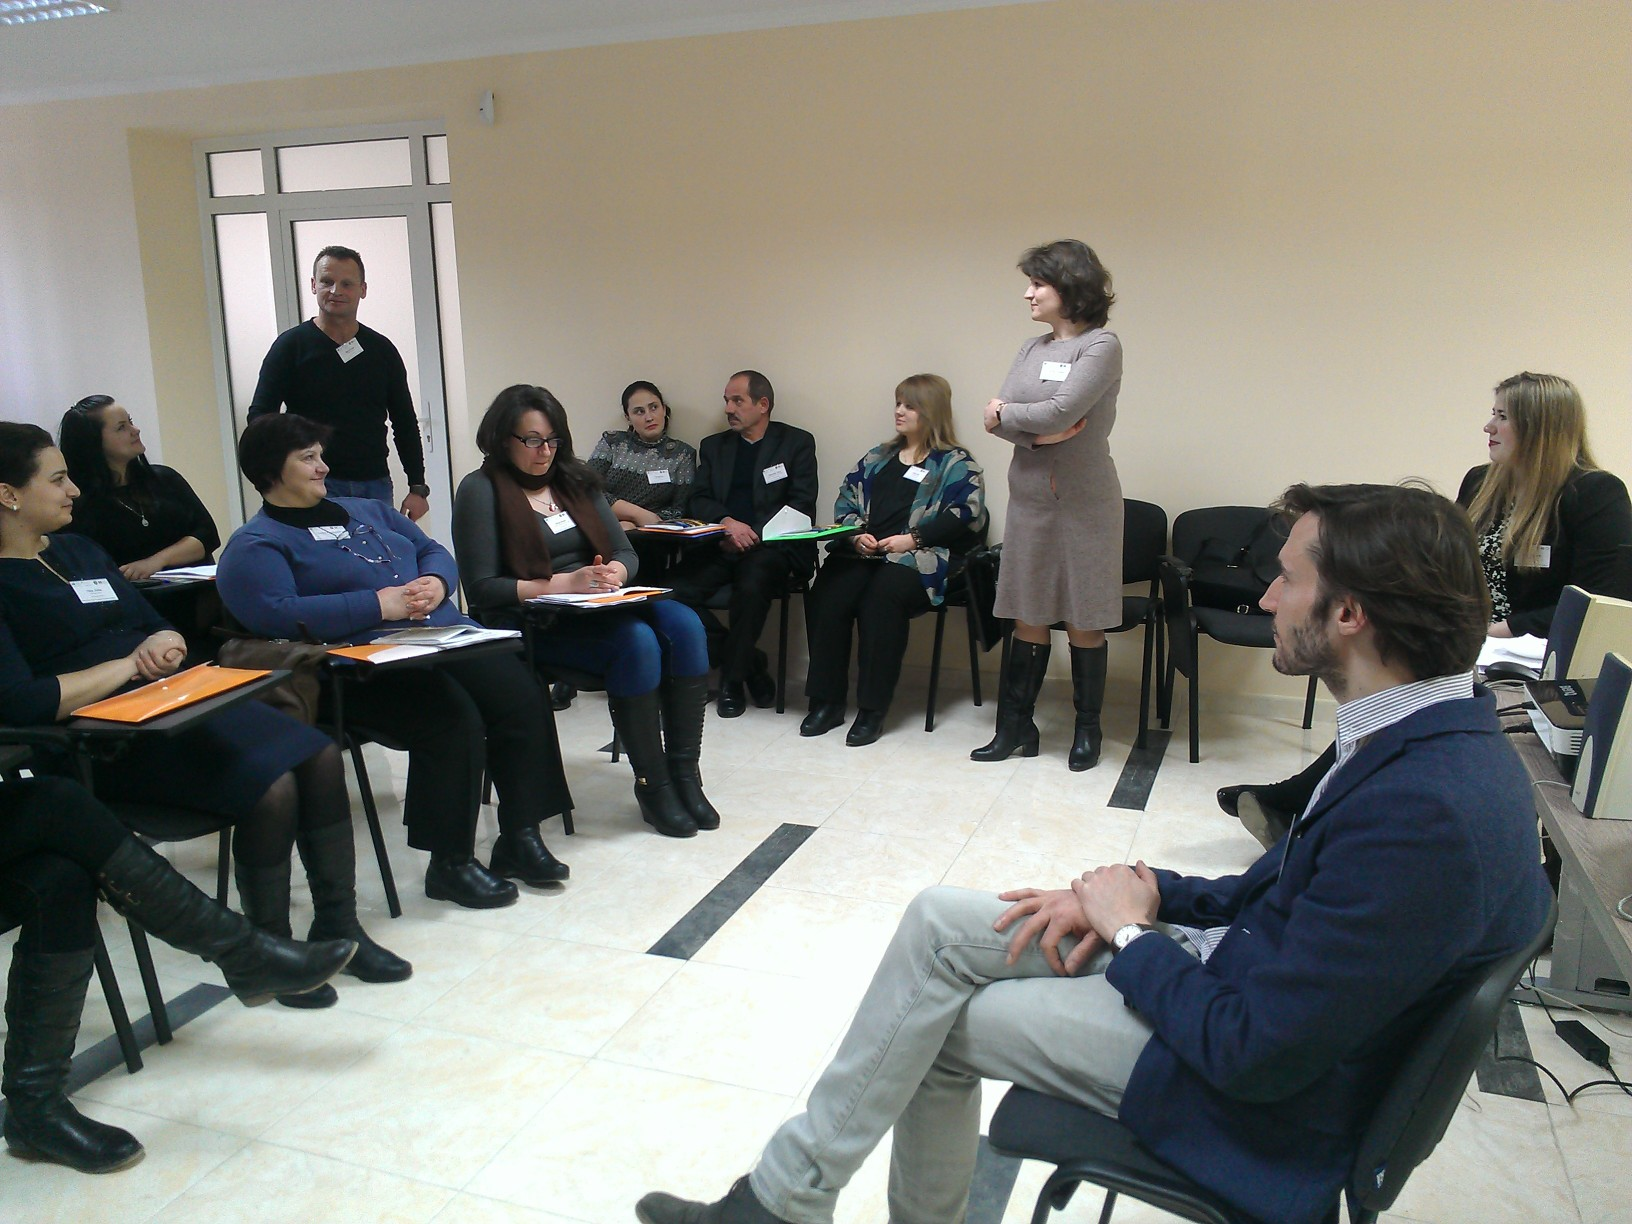 2015_02_11 Psihiatrii din patru raioane au inceput instruirea privind serviciile de sanatate mintala comunitara in Republica Moldov (2)